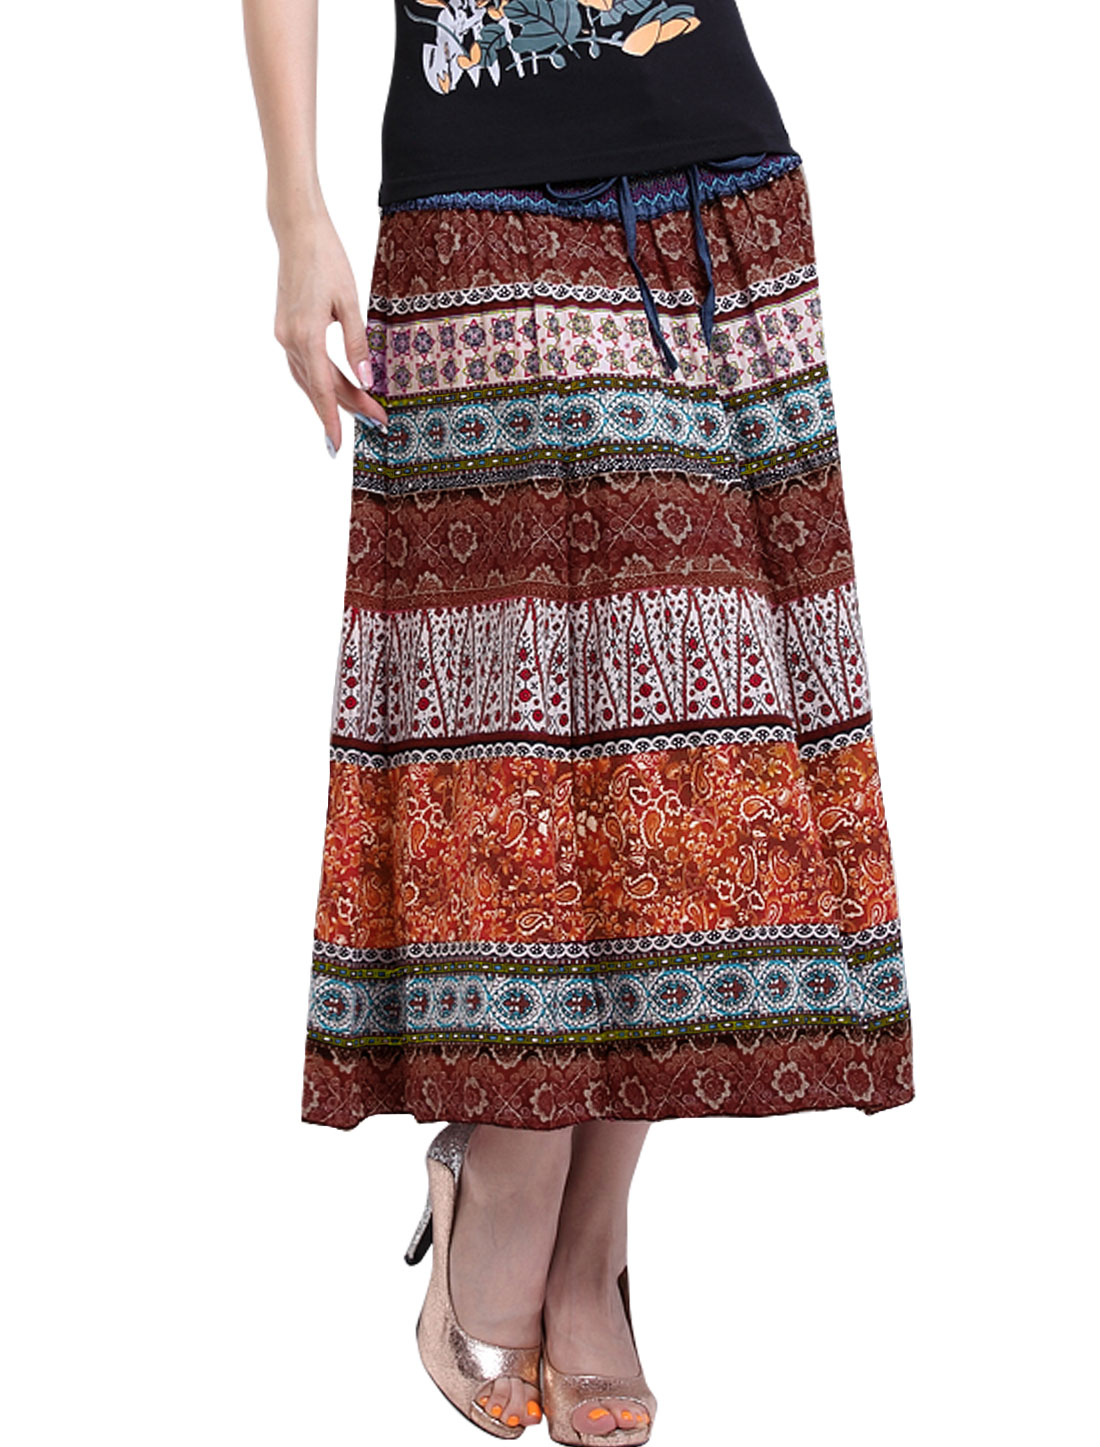 Women Smocked Waist Self Tie Decor Novelty Prints Boho Skirt Brown S